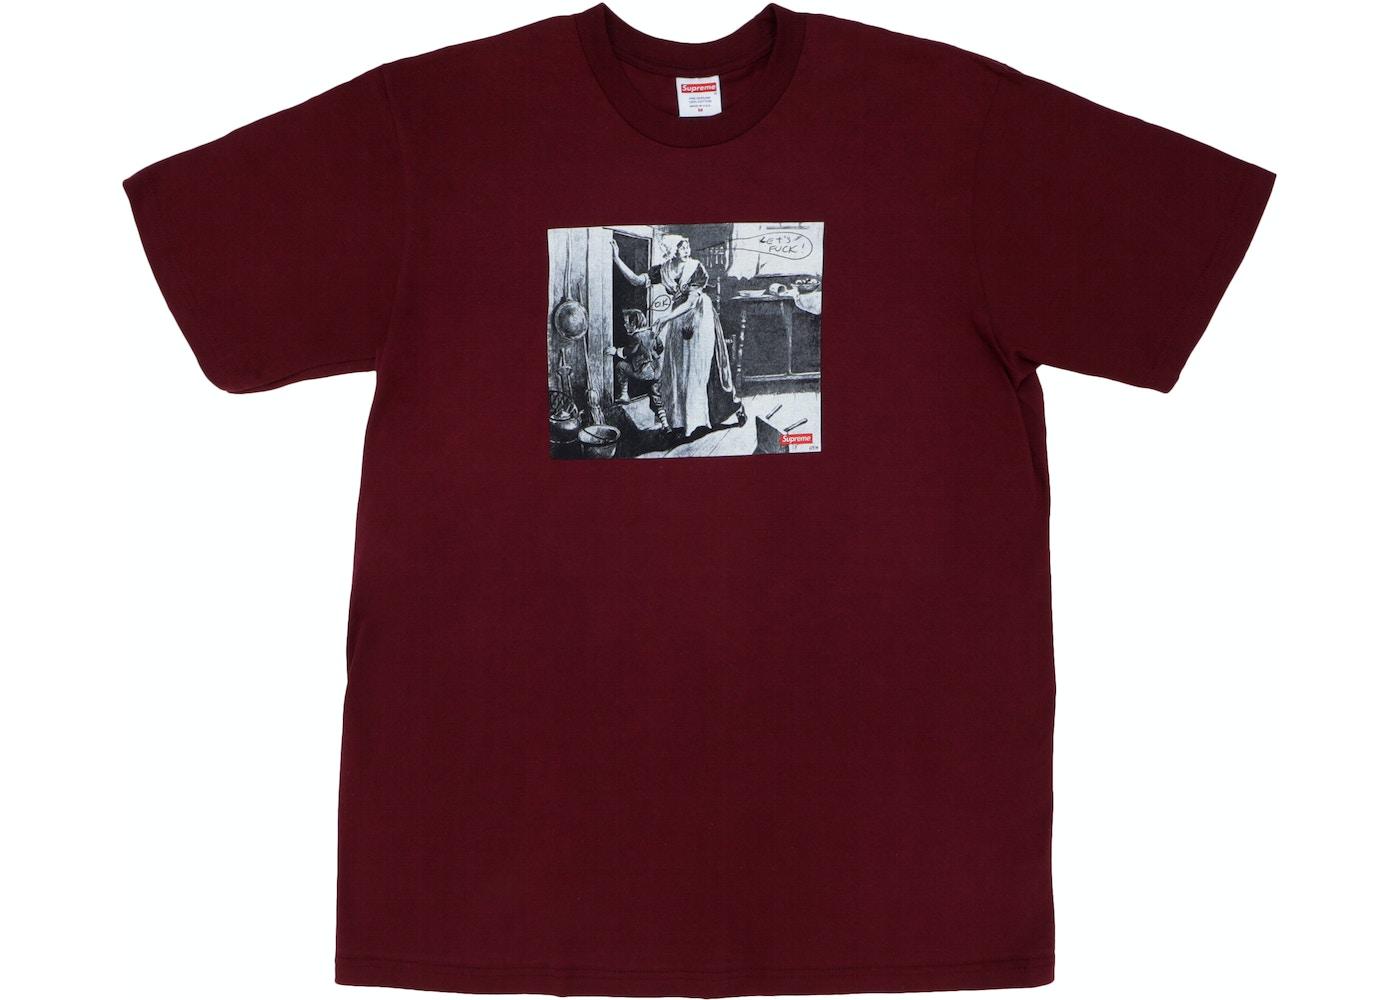 0a9c4ac1 Streetwear - Supreme T-Shirts - New Highest Bids